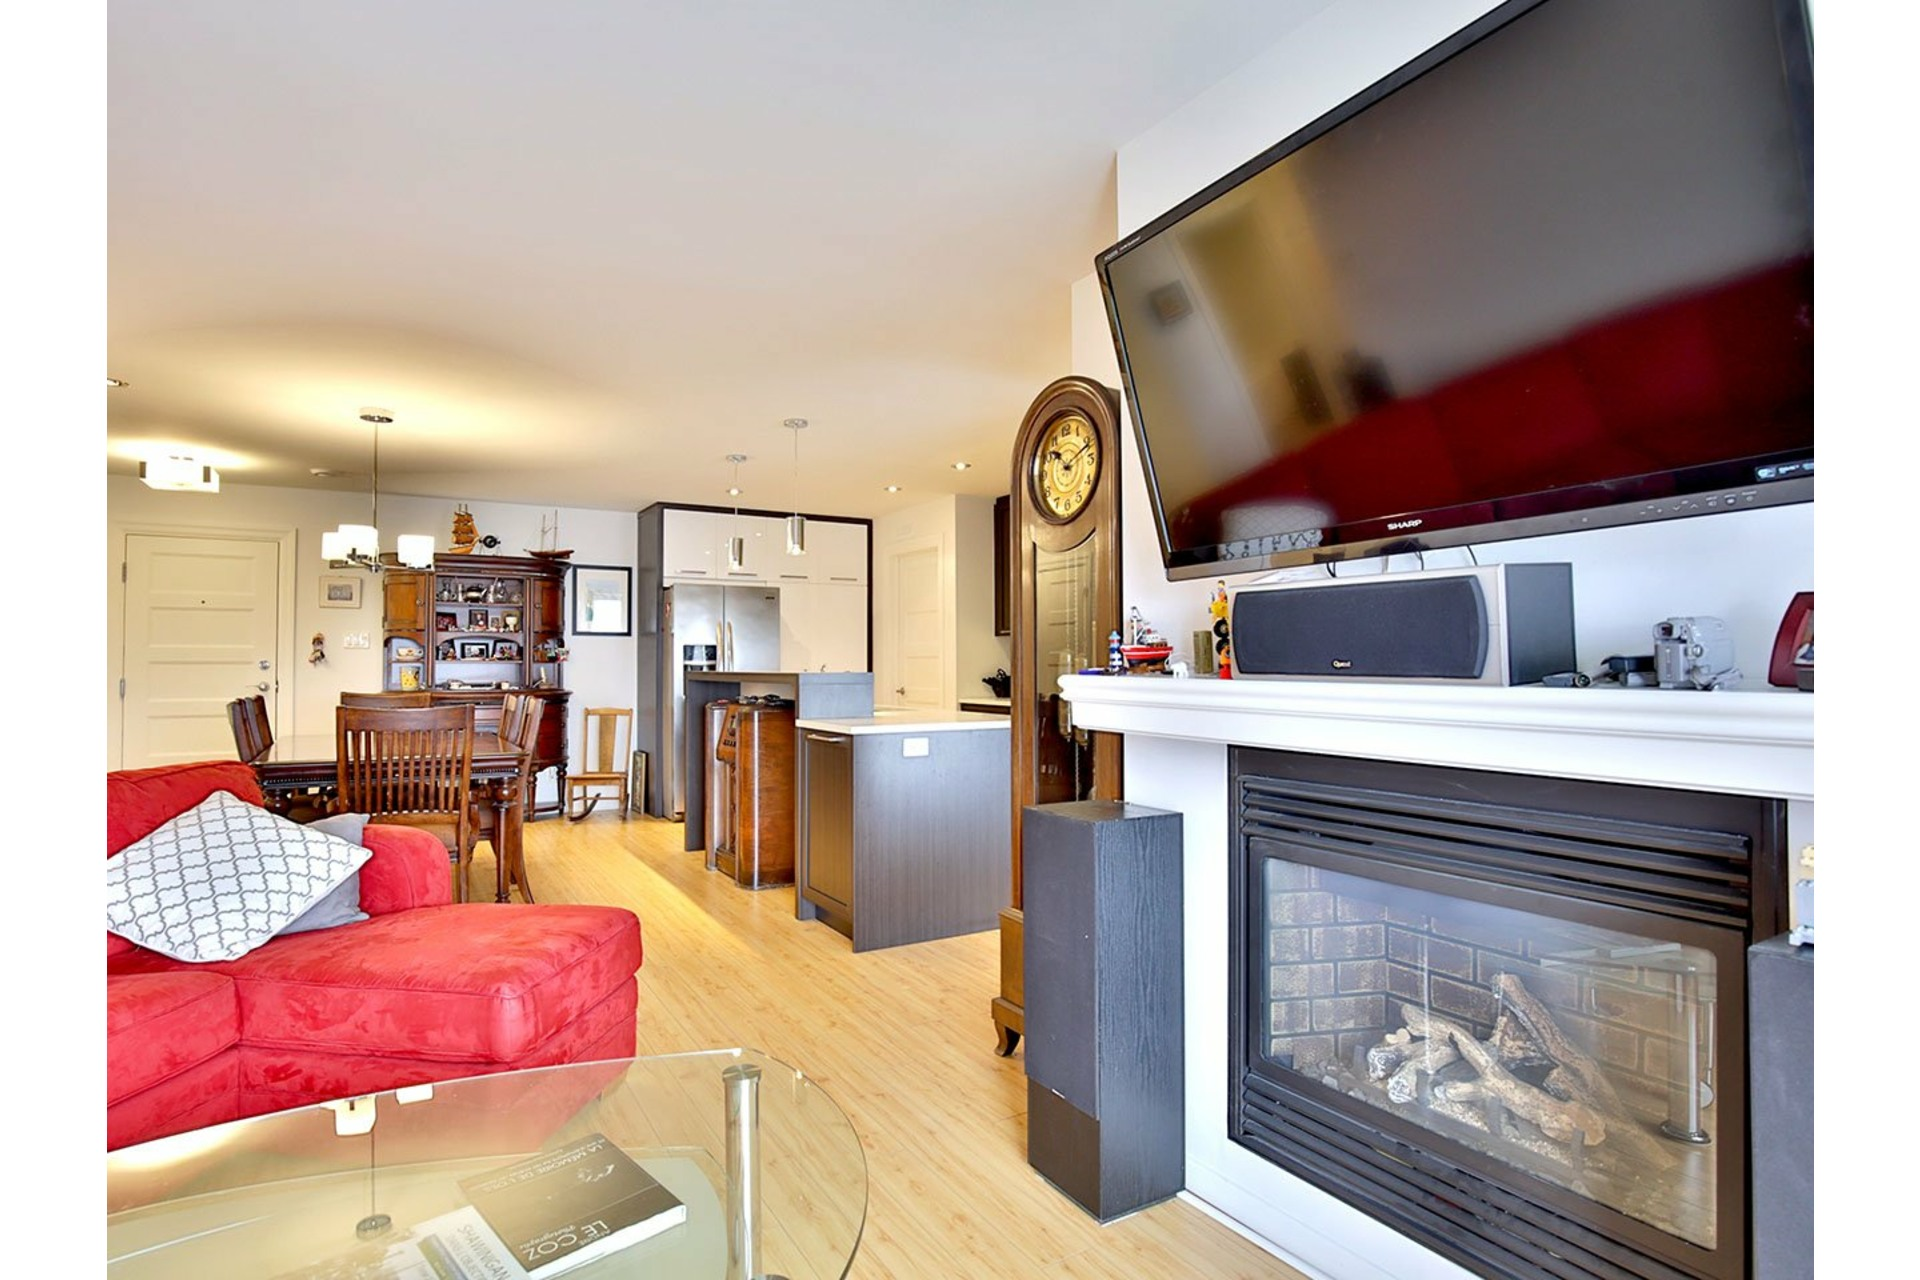 image 10 - Apartment For sale Varennes - 5 rooms